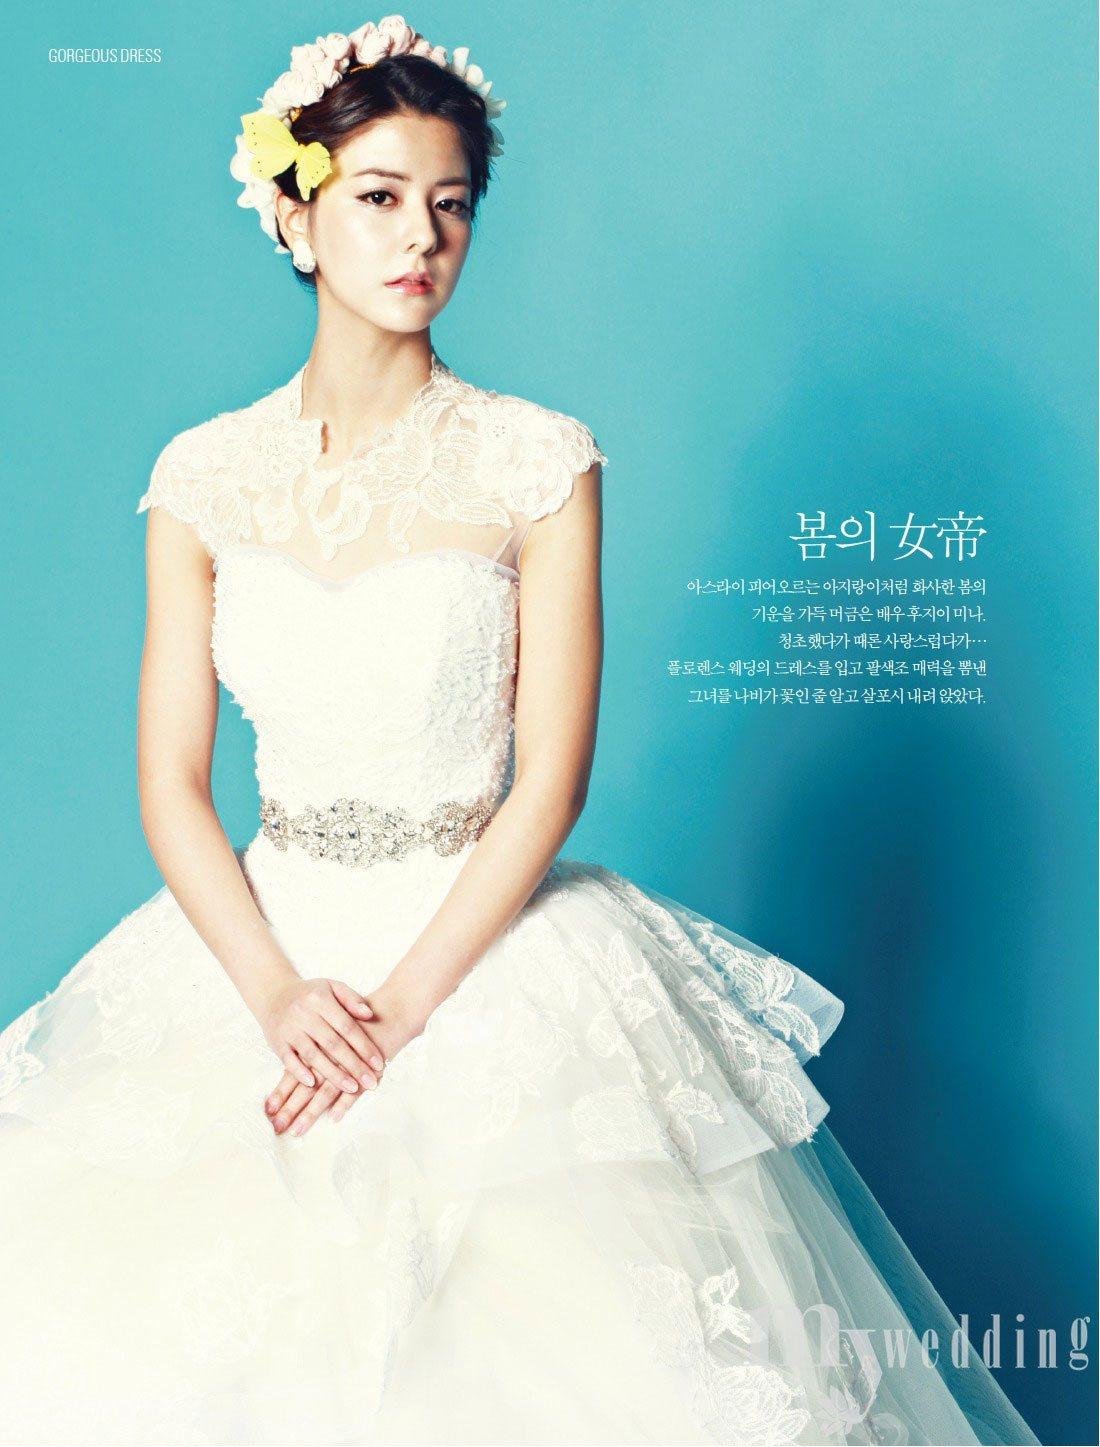 mina-fujii-wedding-magazine-1